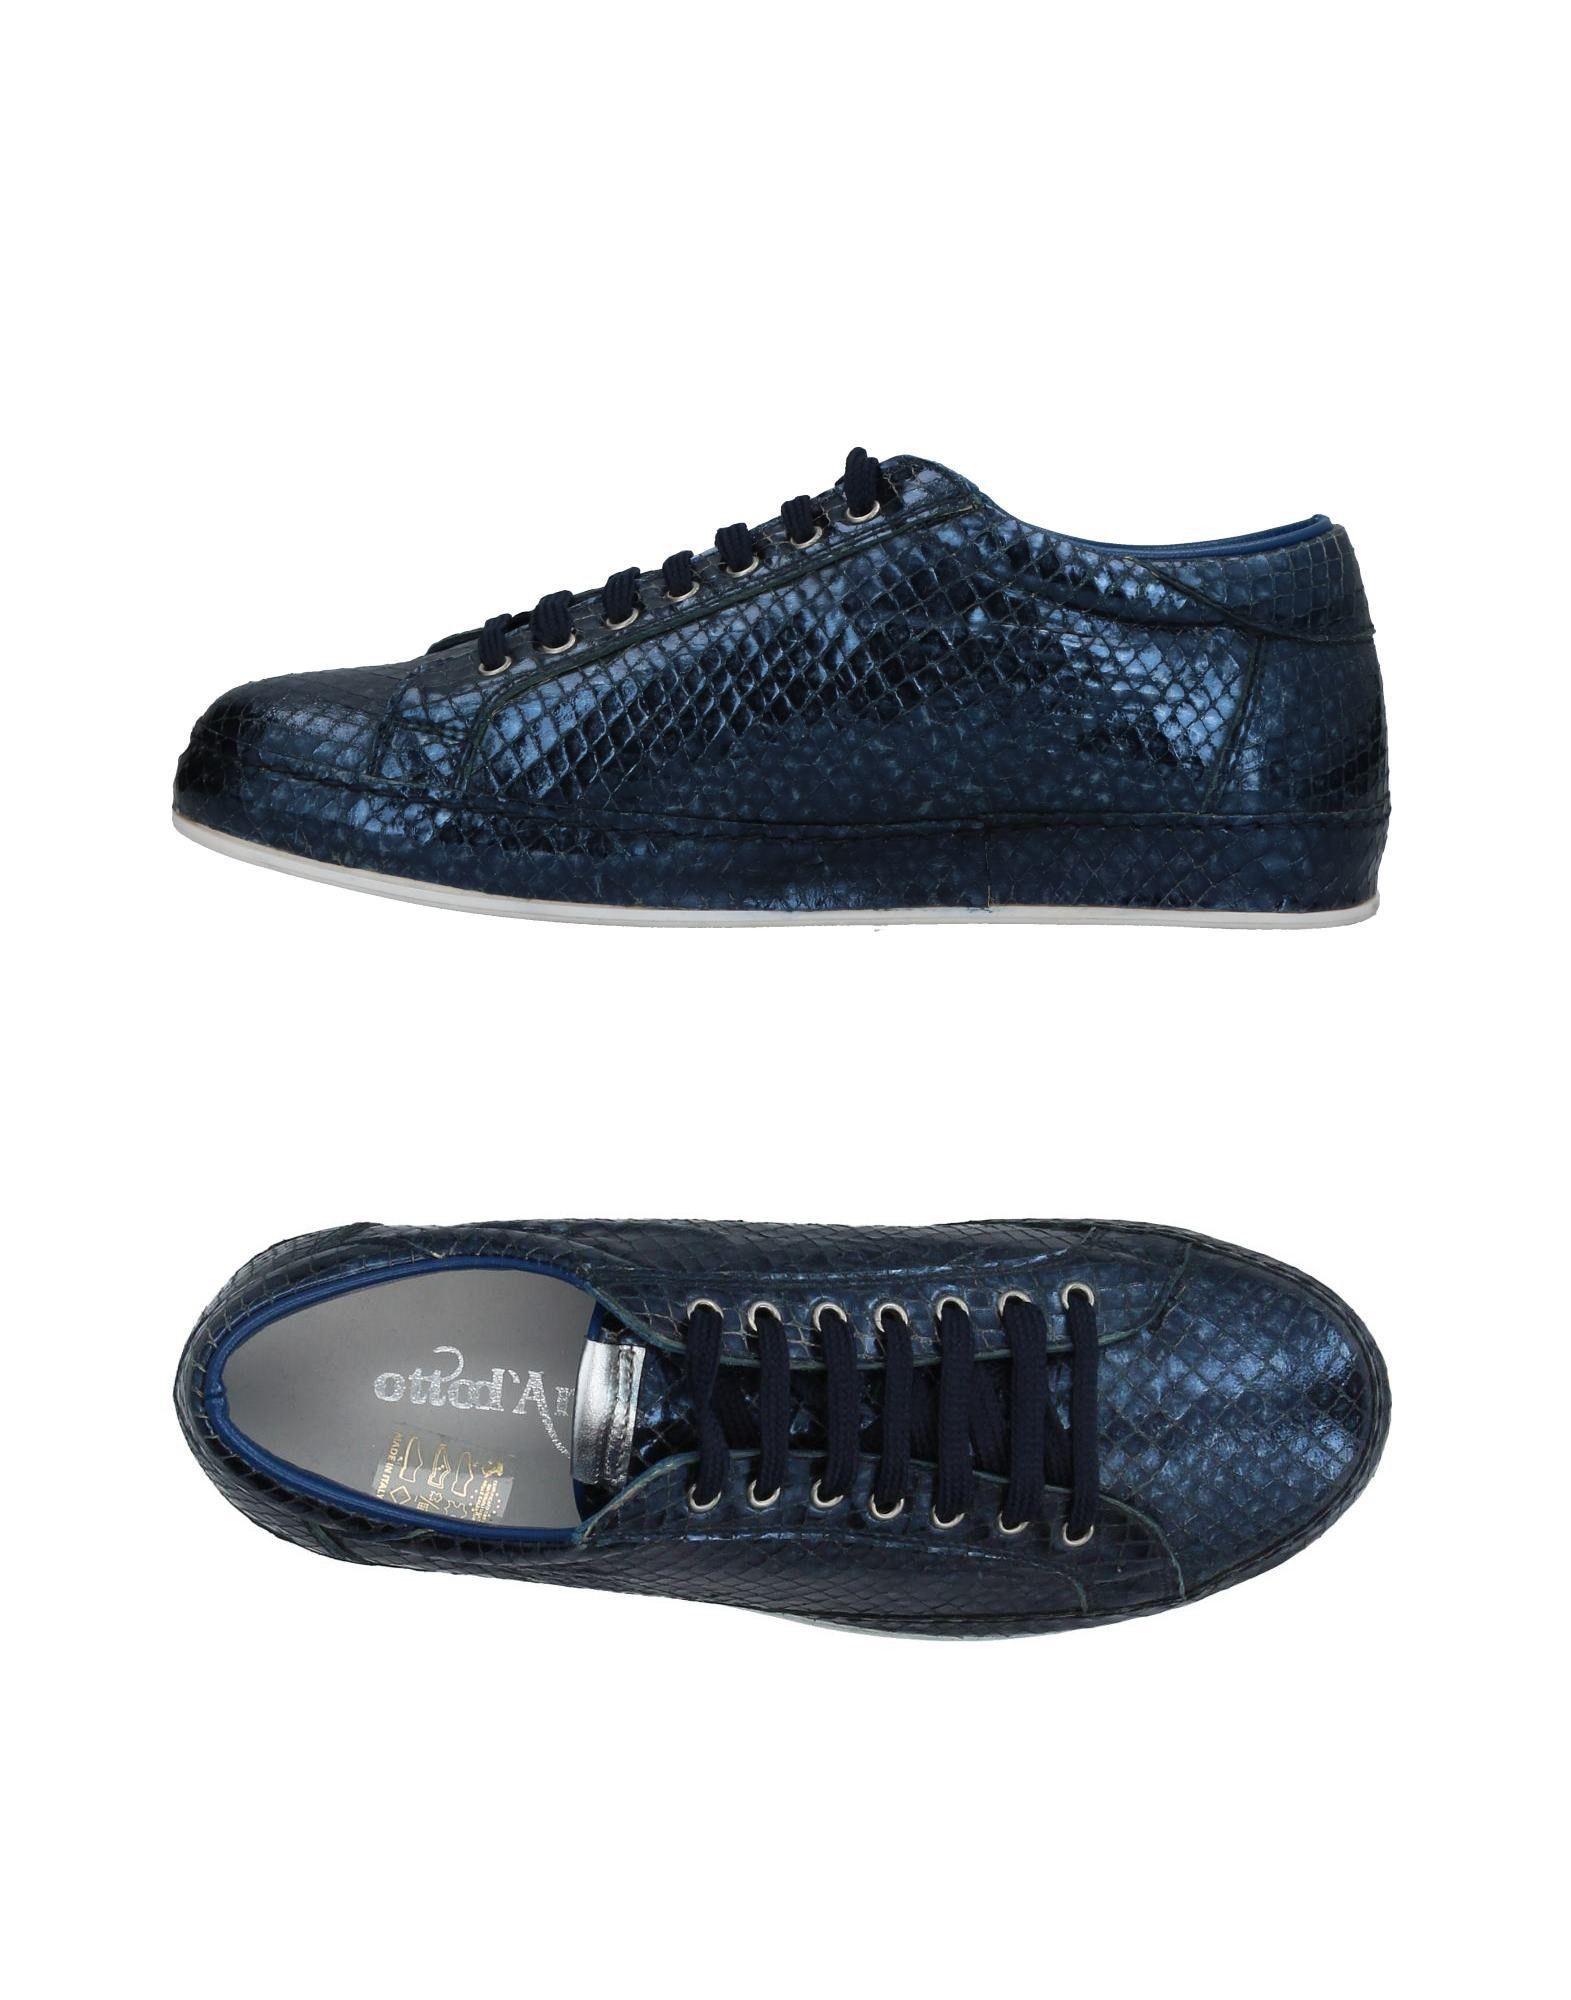 Ottod'ame Sneakers Damen  11401845LJ Gute Qualität beliebte Schuhe